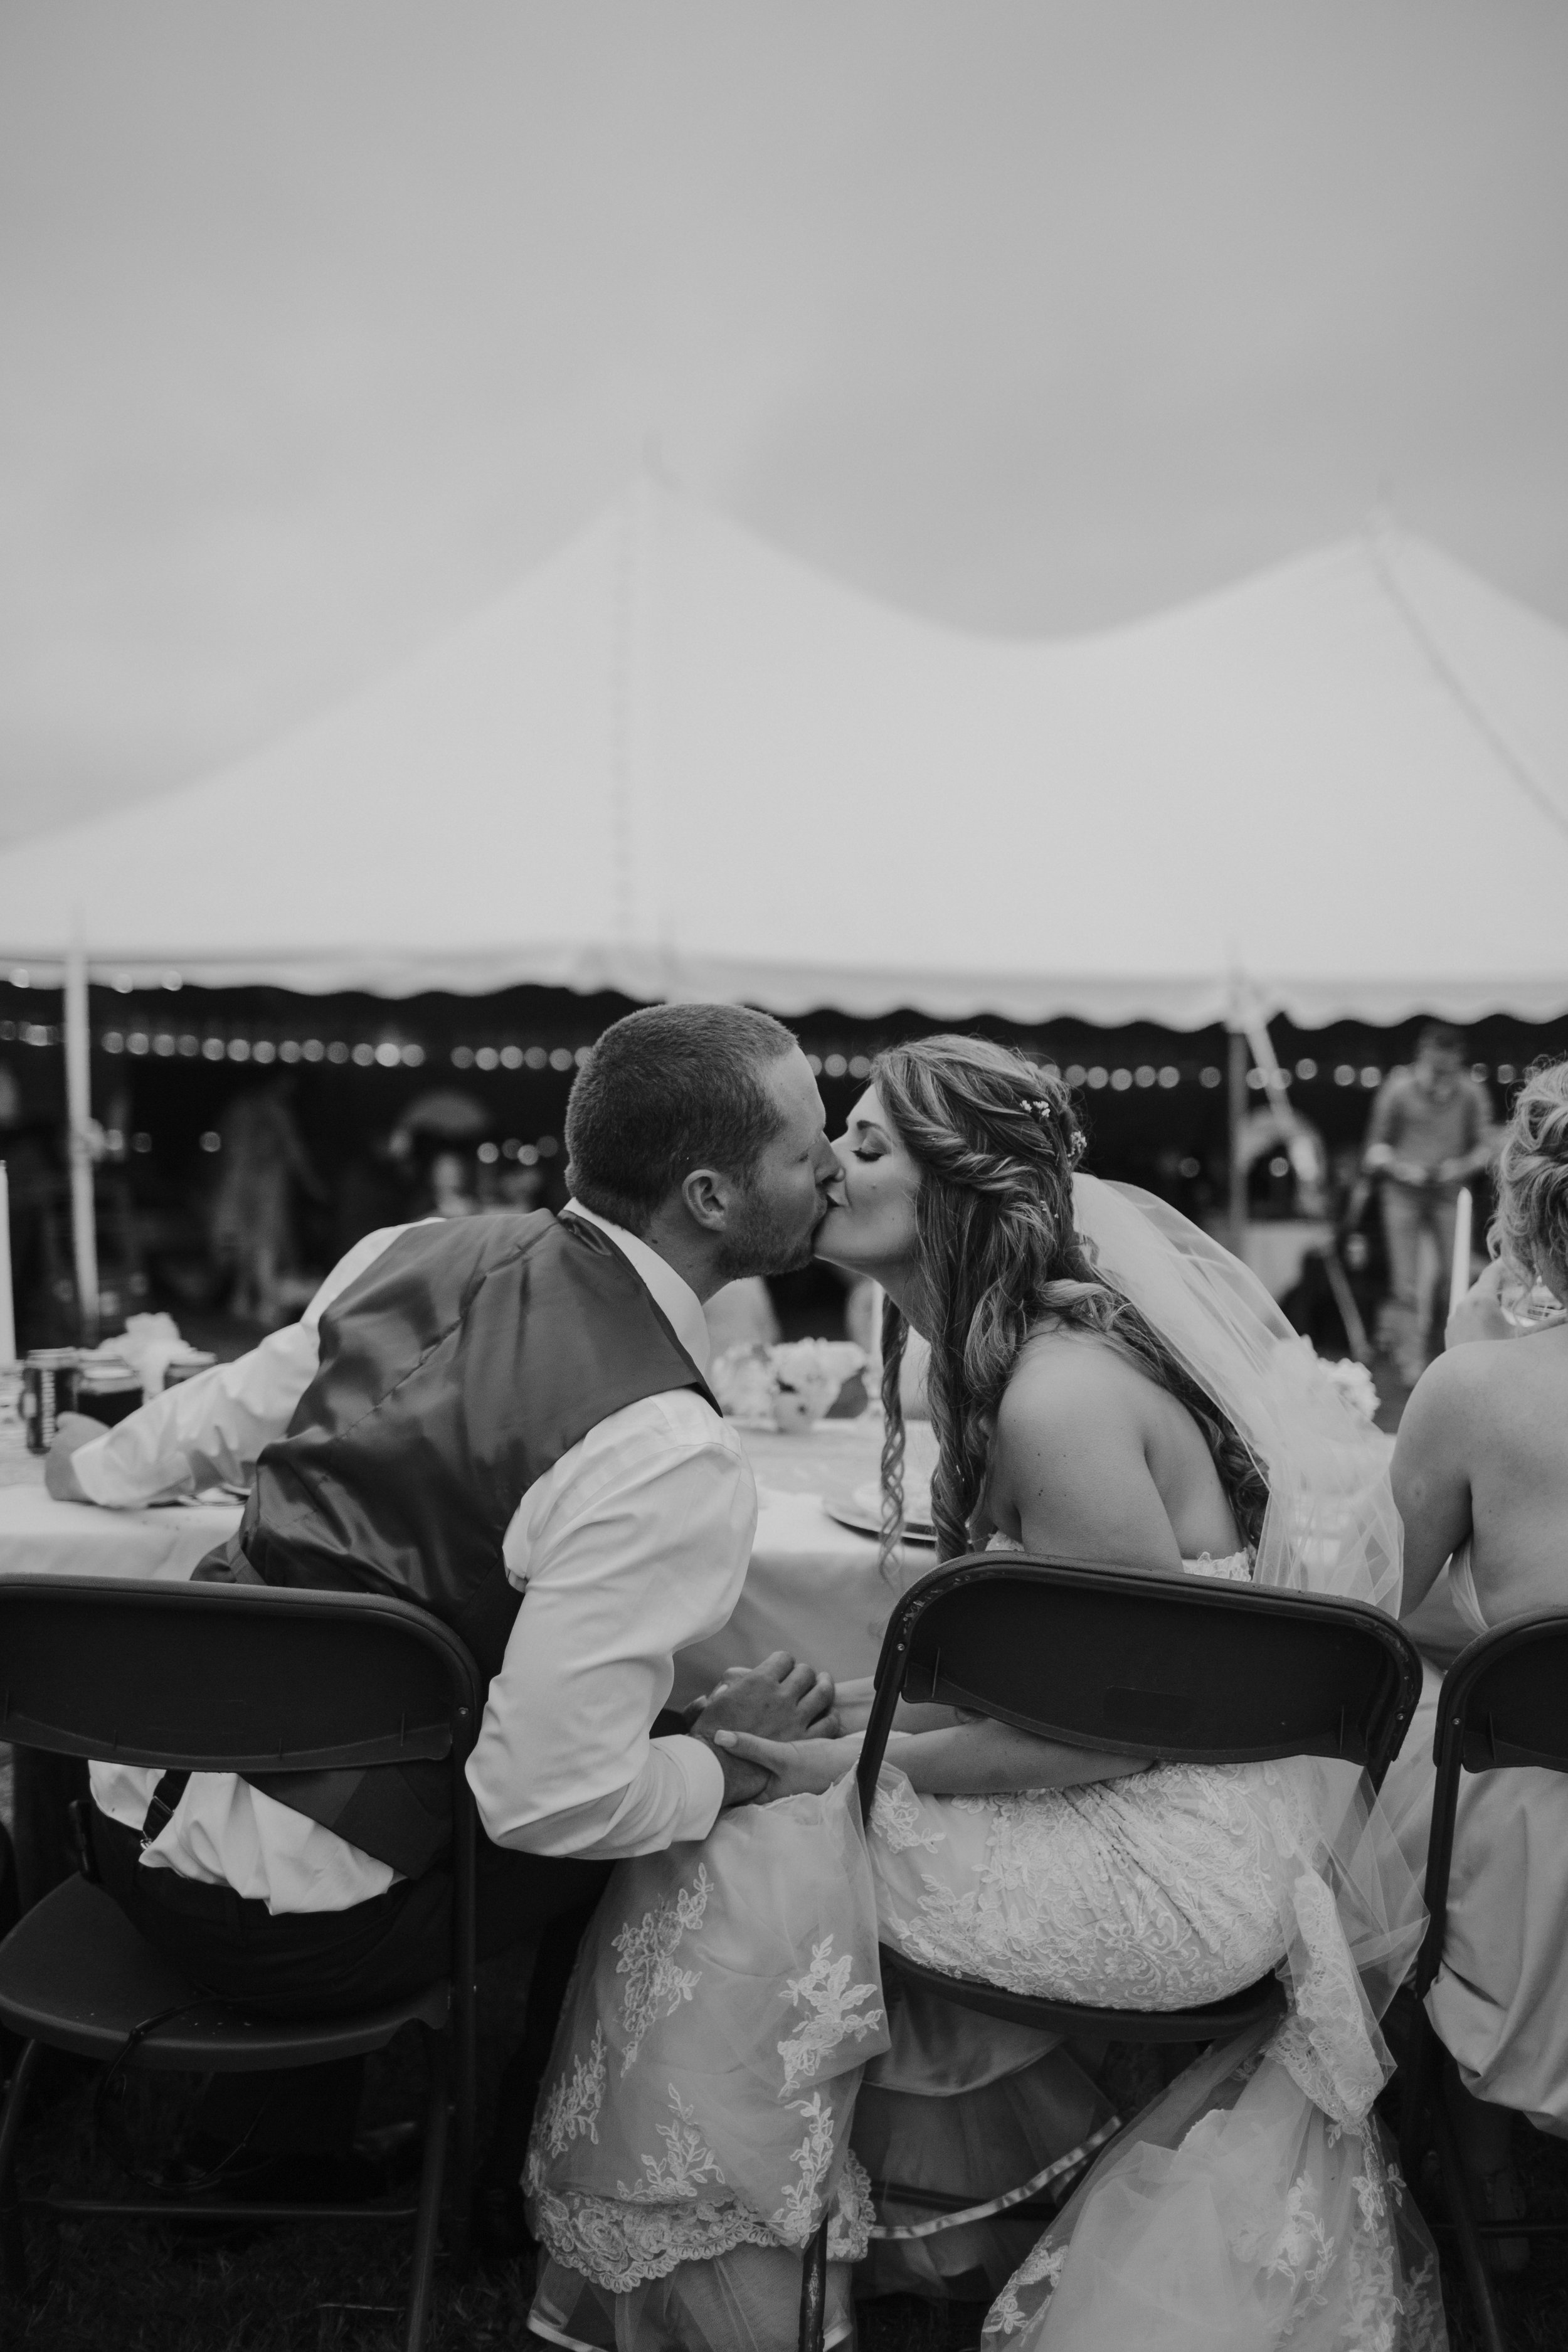 Olympic-Peninsula-Wedding-Photographer-PNW-Forks-Port-Angeles-Kayla-Dawn-Photography-engagement-Olympic-National-Park-222.jpg